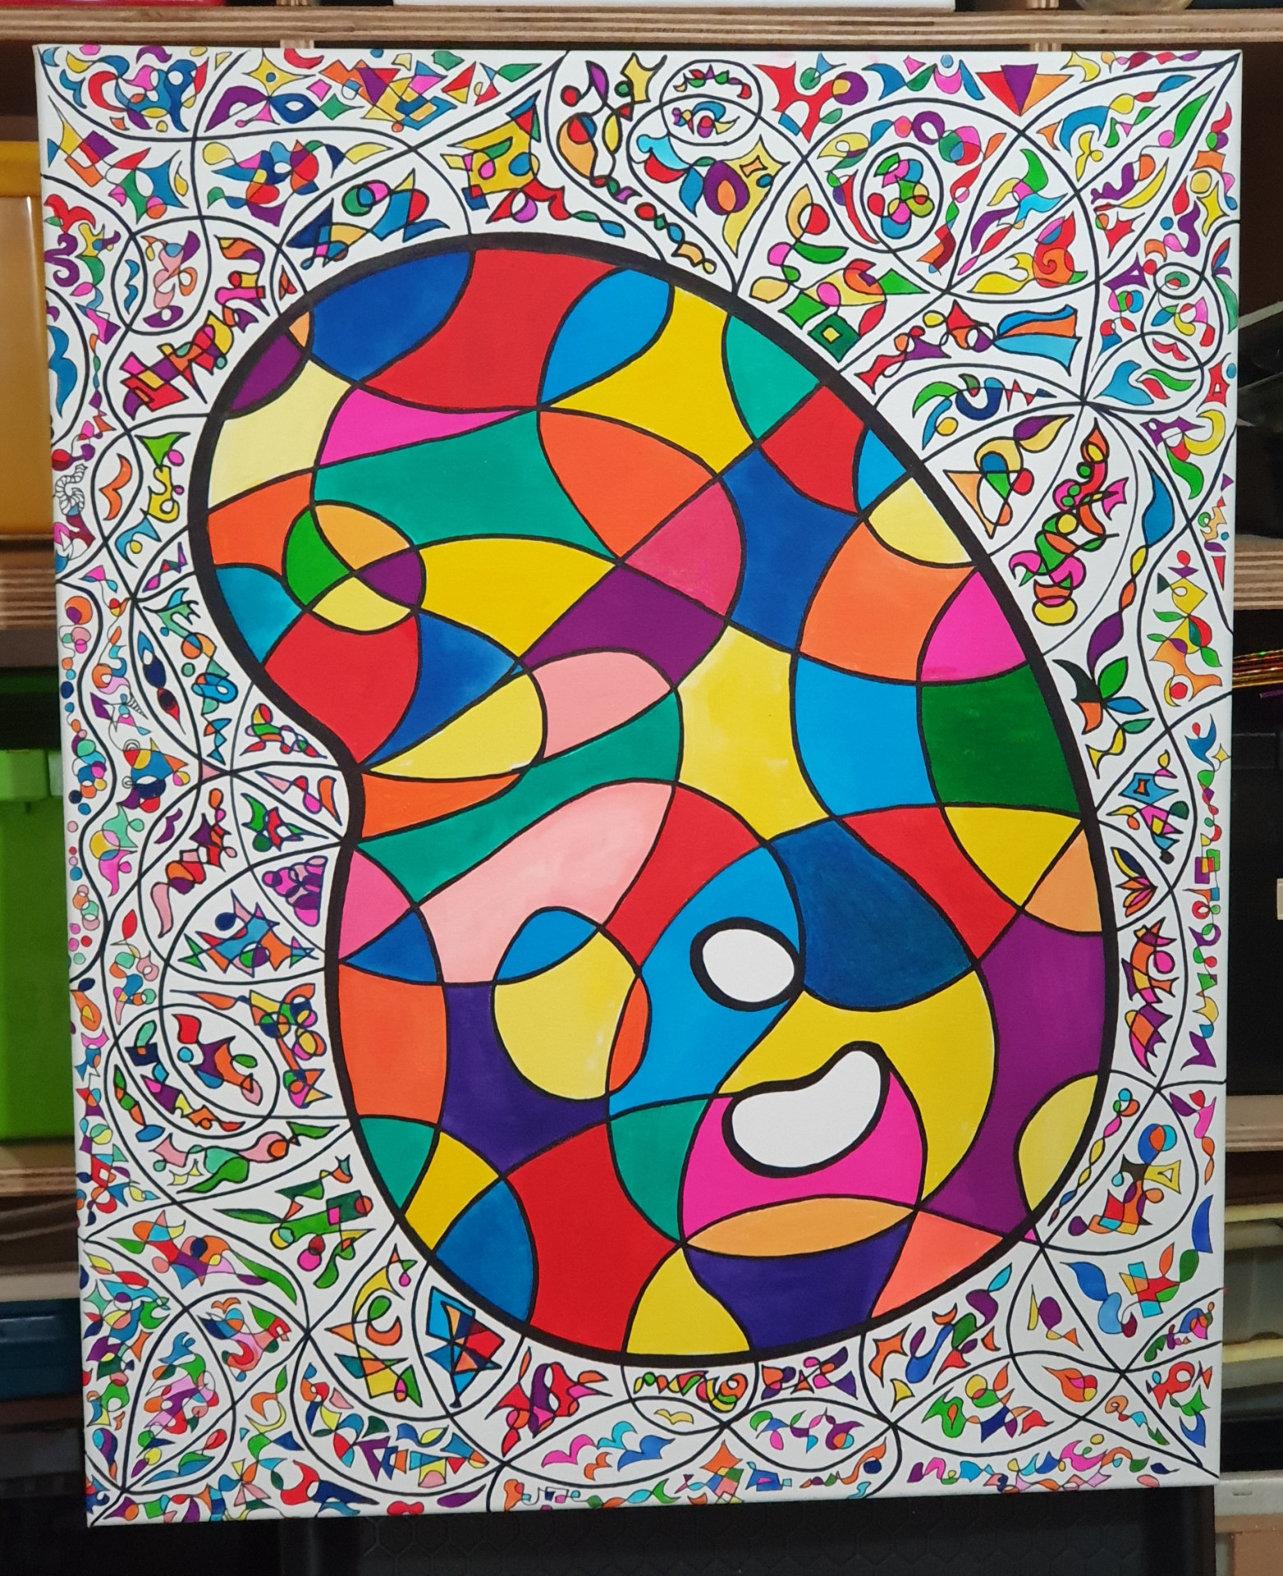 Final Art Solutions Symbol Hybrid by Silvia Hartmann September 2019